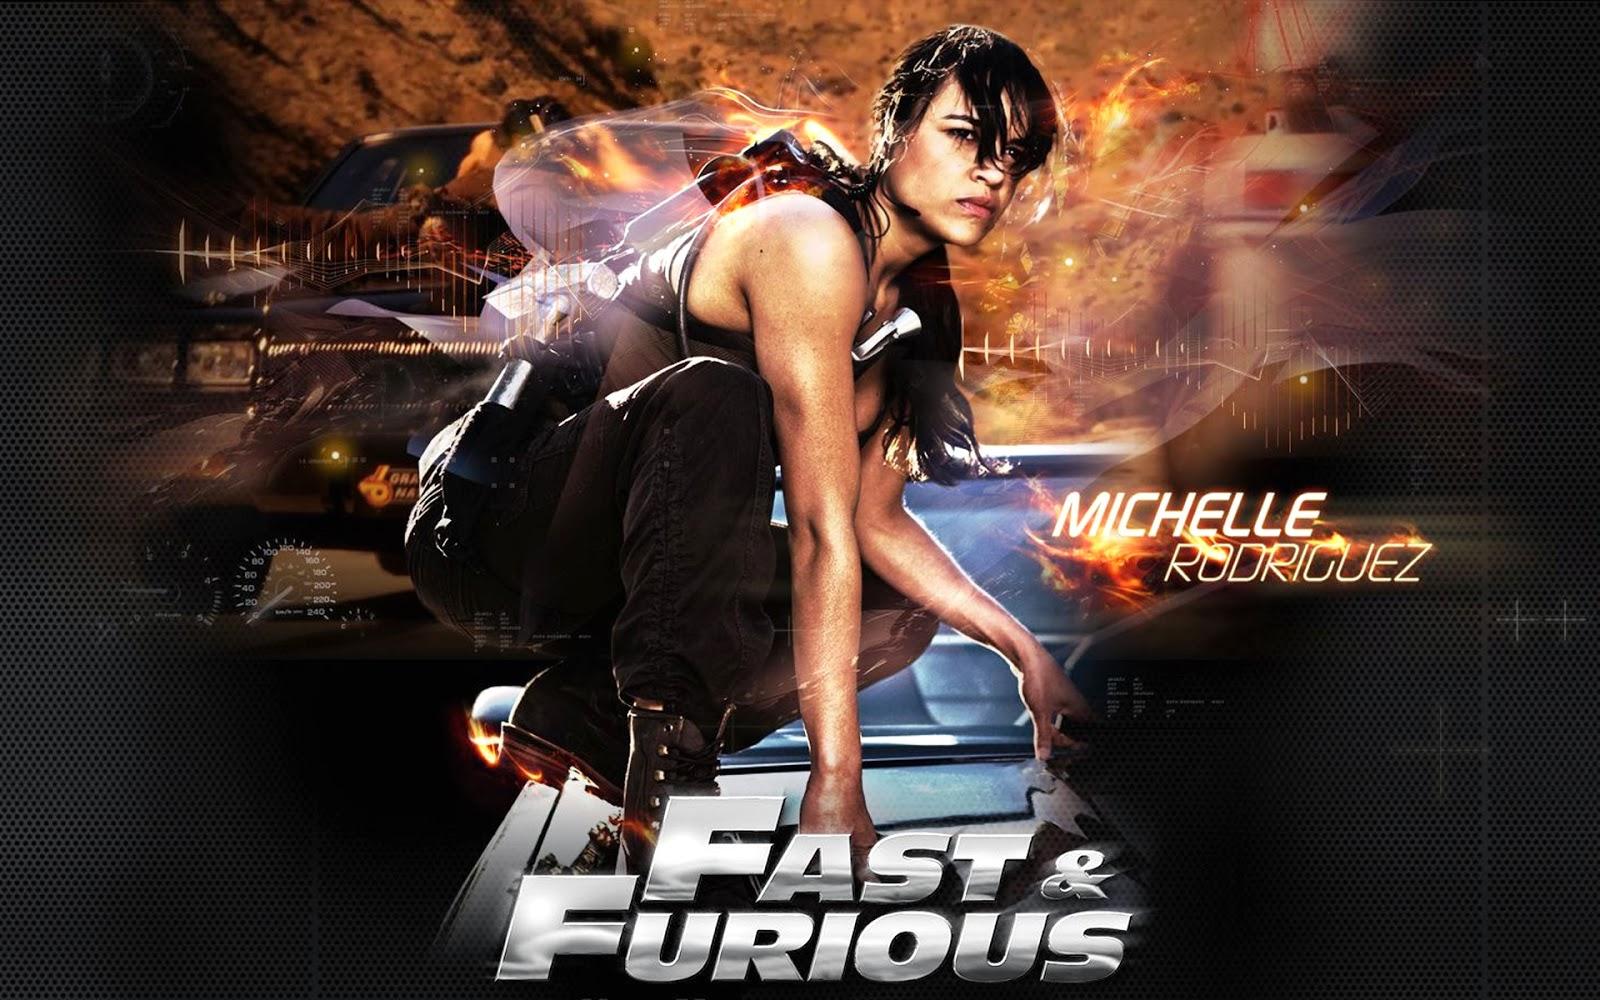 hd wallpaper download fast amp furious 6 2013 full movie